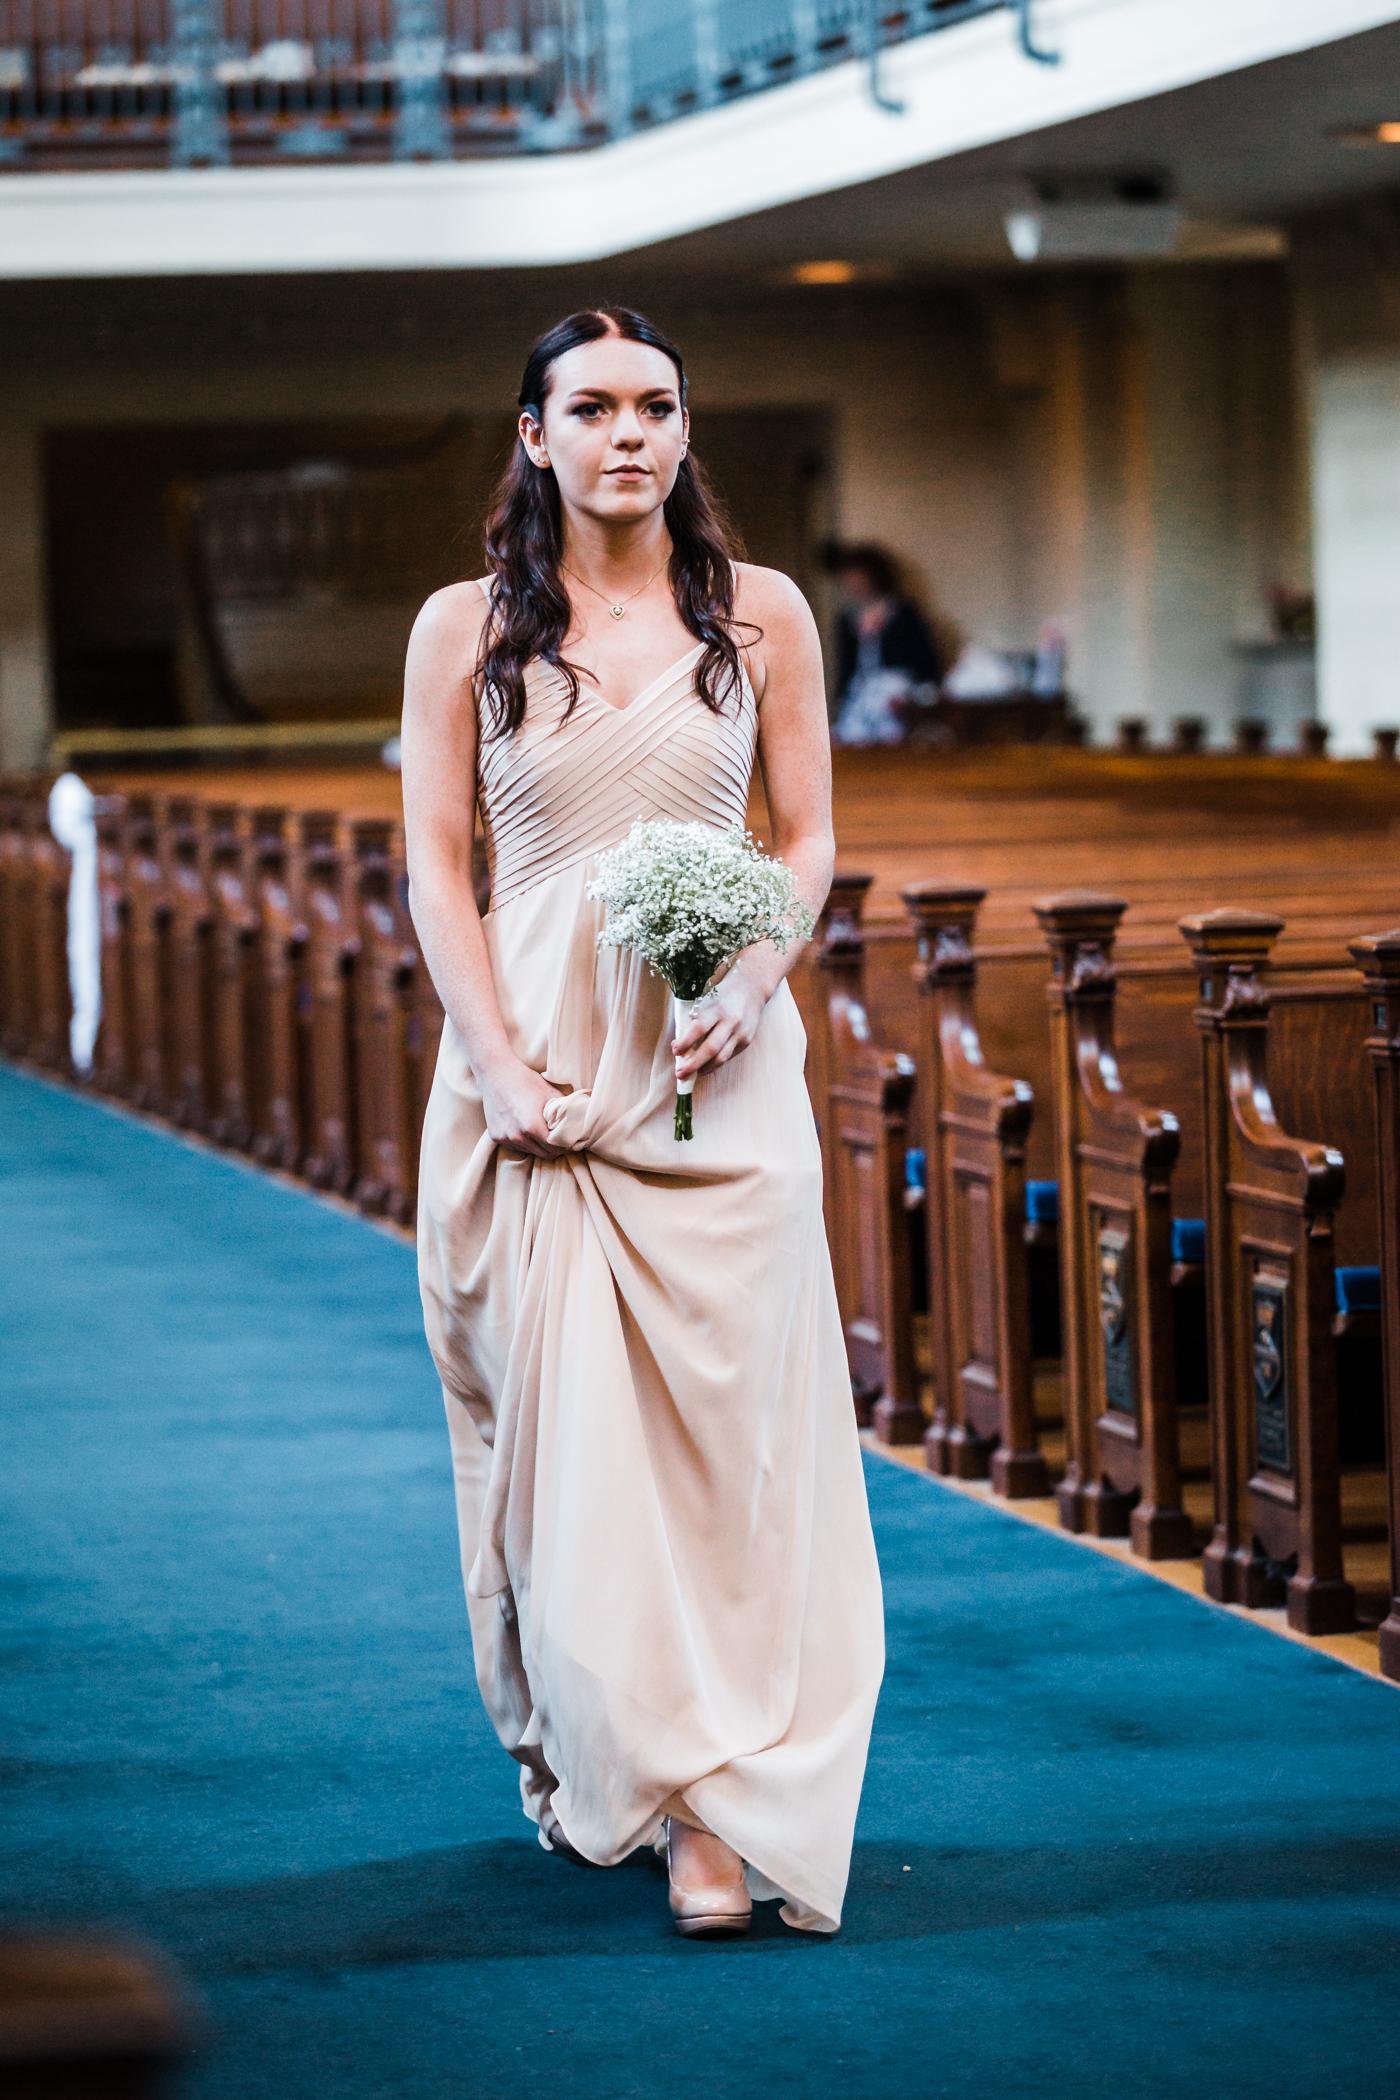 blush and tan wedding color scheme - Naval Academy chapel